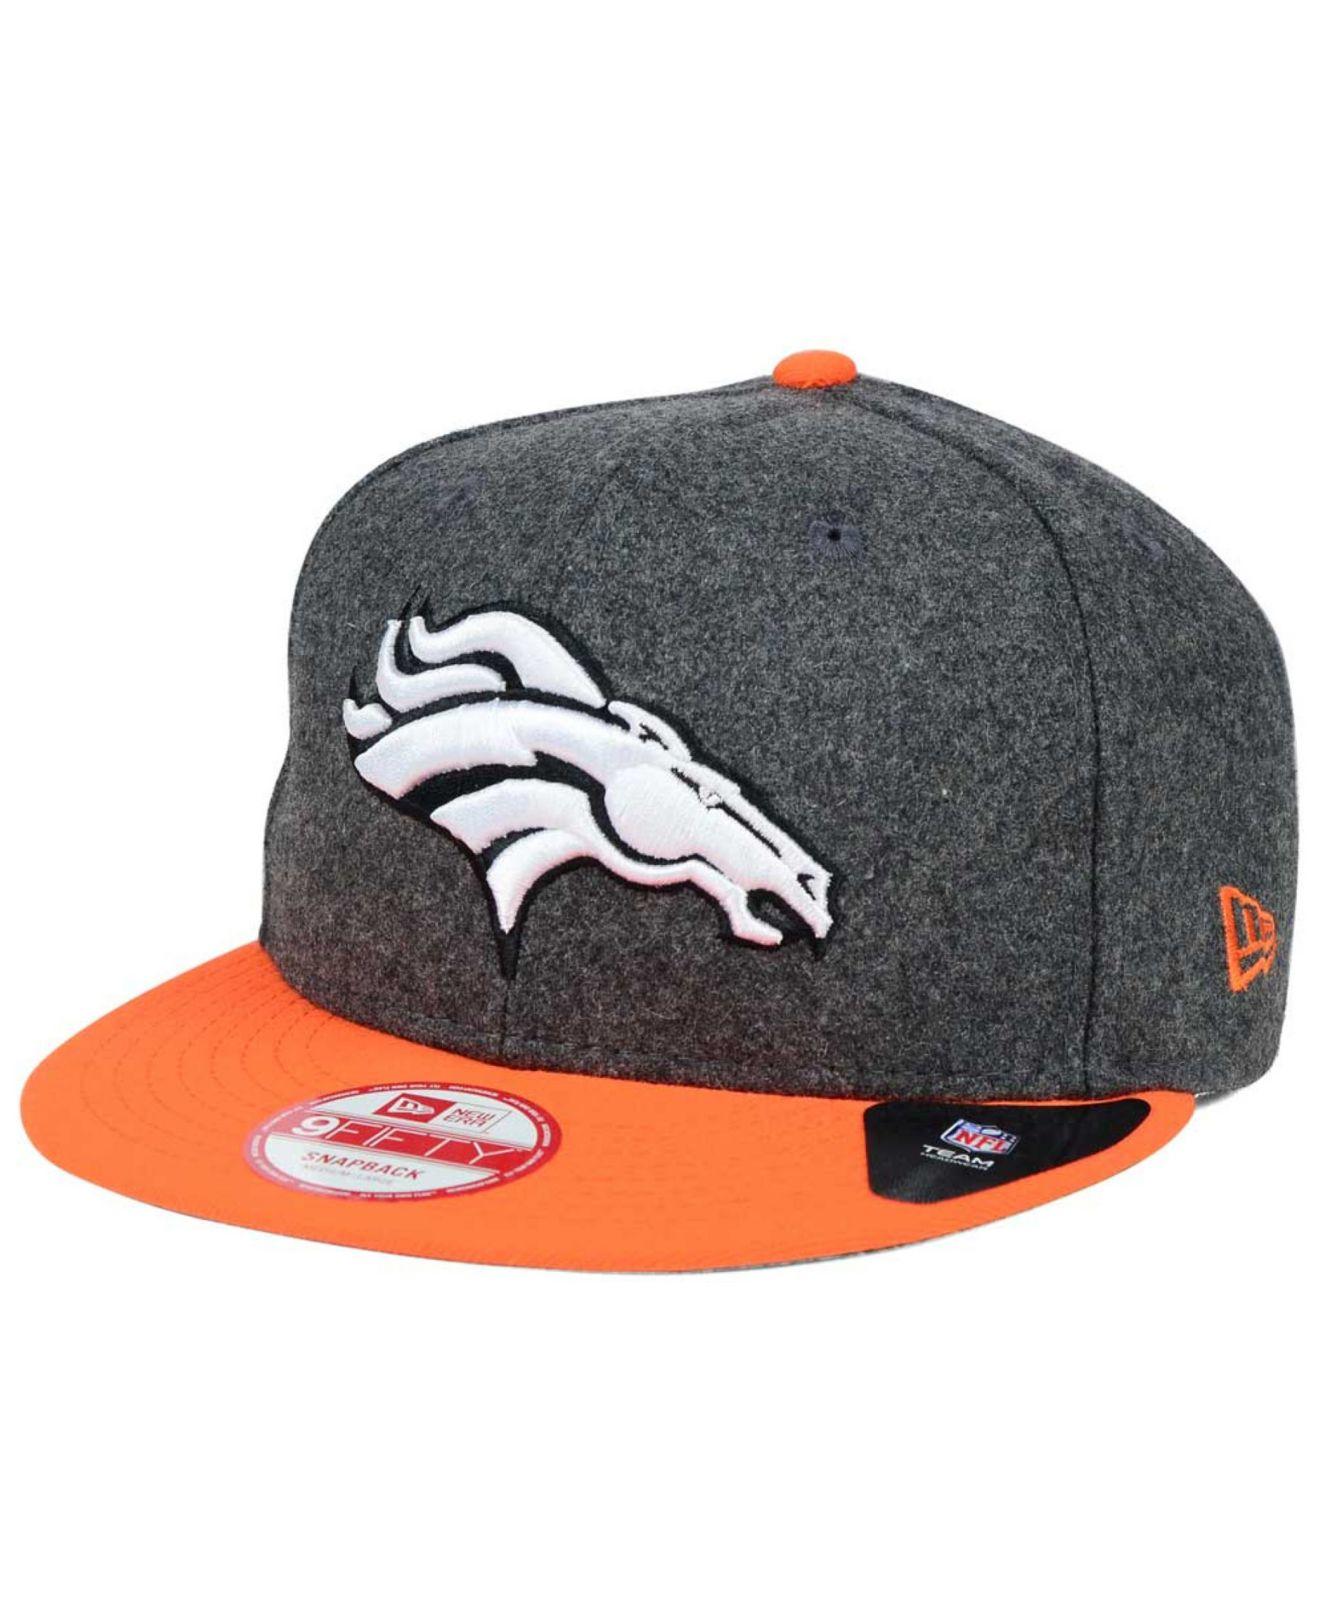 reputable site d8816 4d580 Lyst - KTZ Denver Broncos Shader Melt 9fifty Snapback Cap in Orange ...